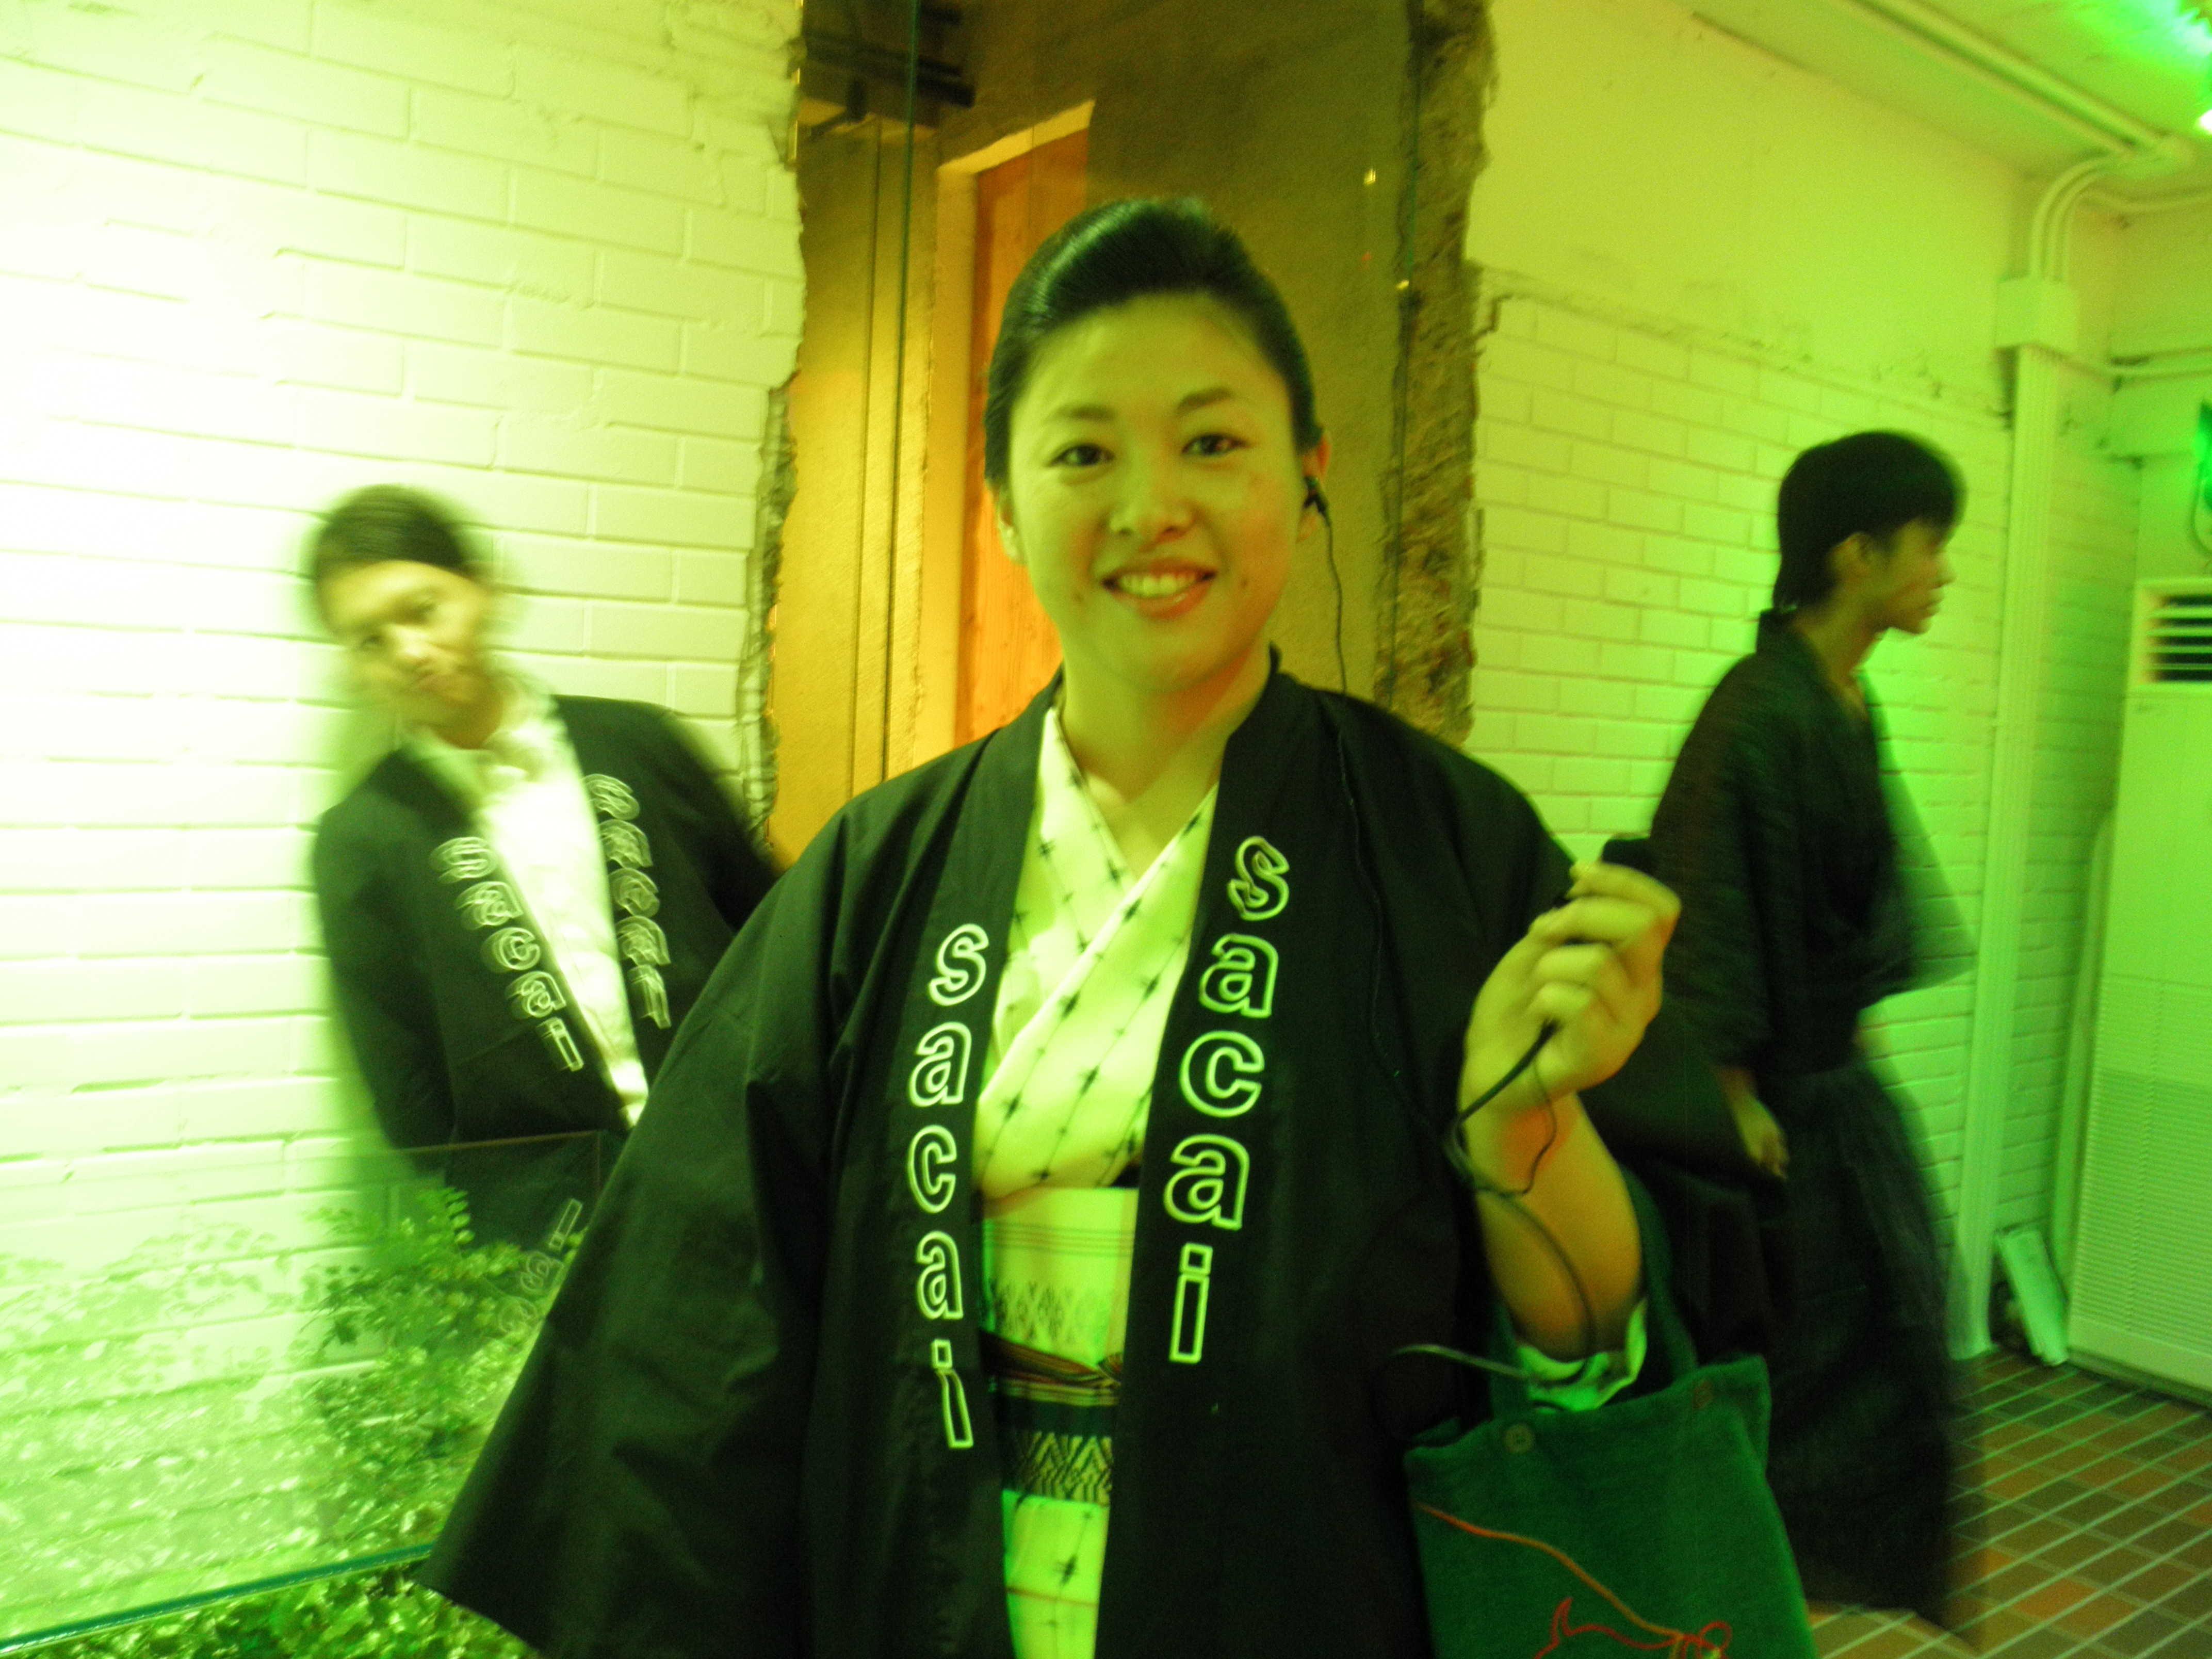 sacai 一周年記念パーティー_d0339890_12274879.jpg